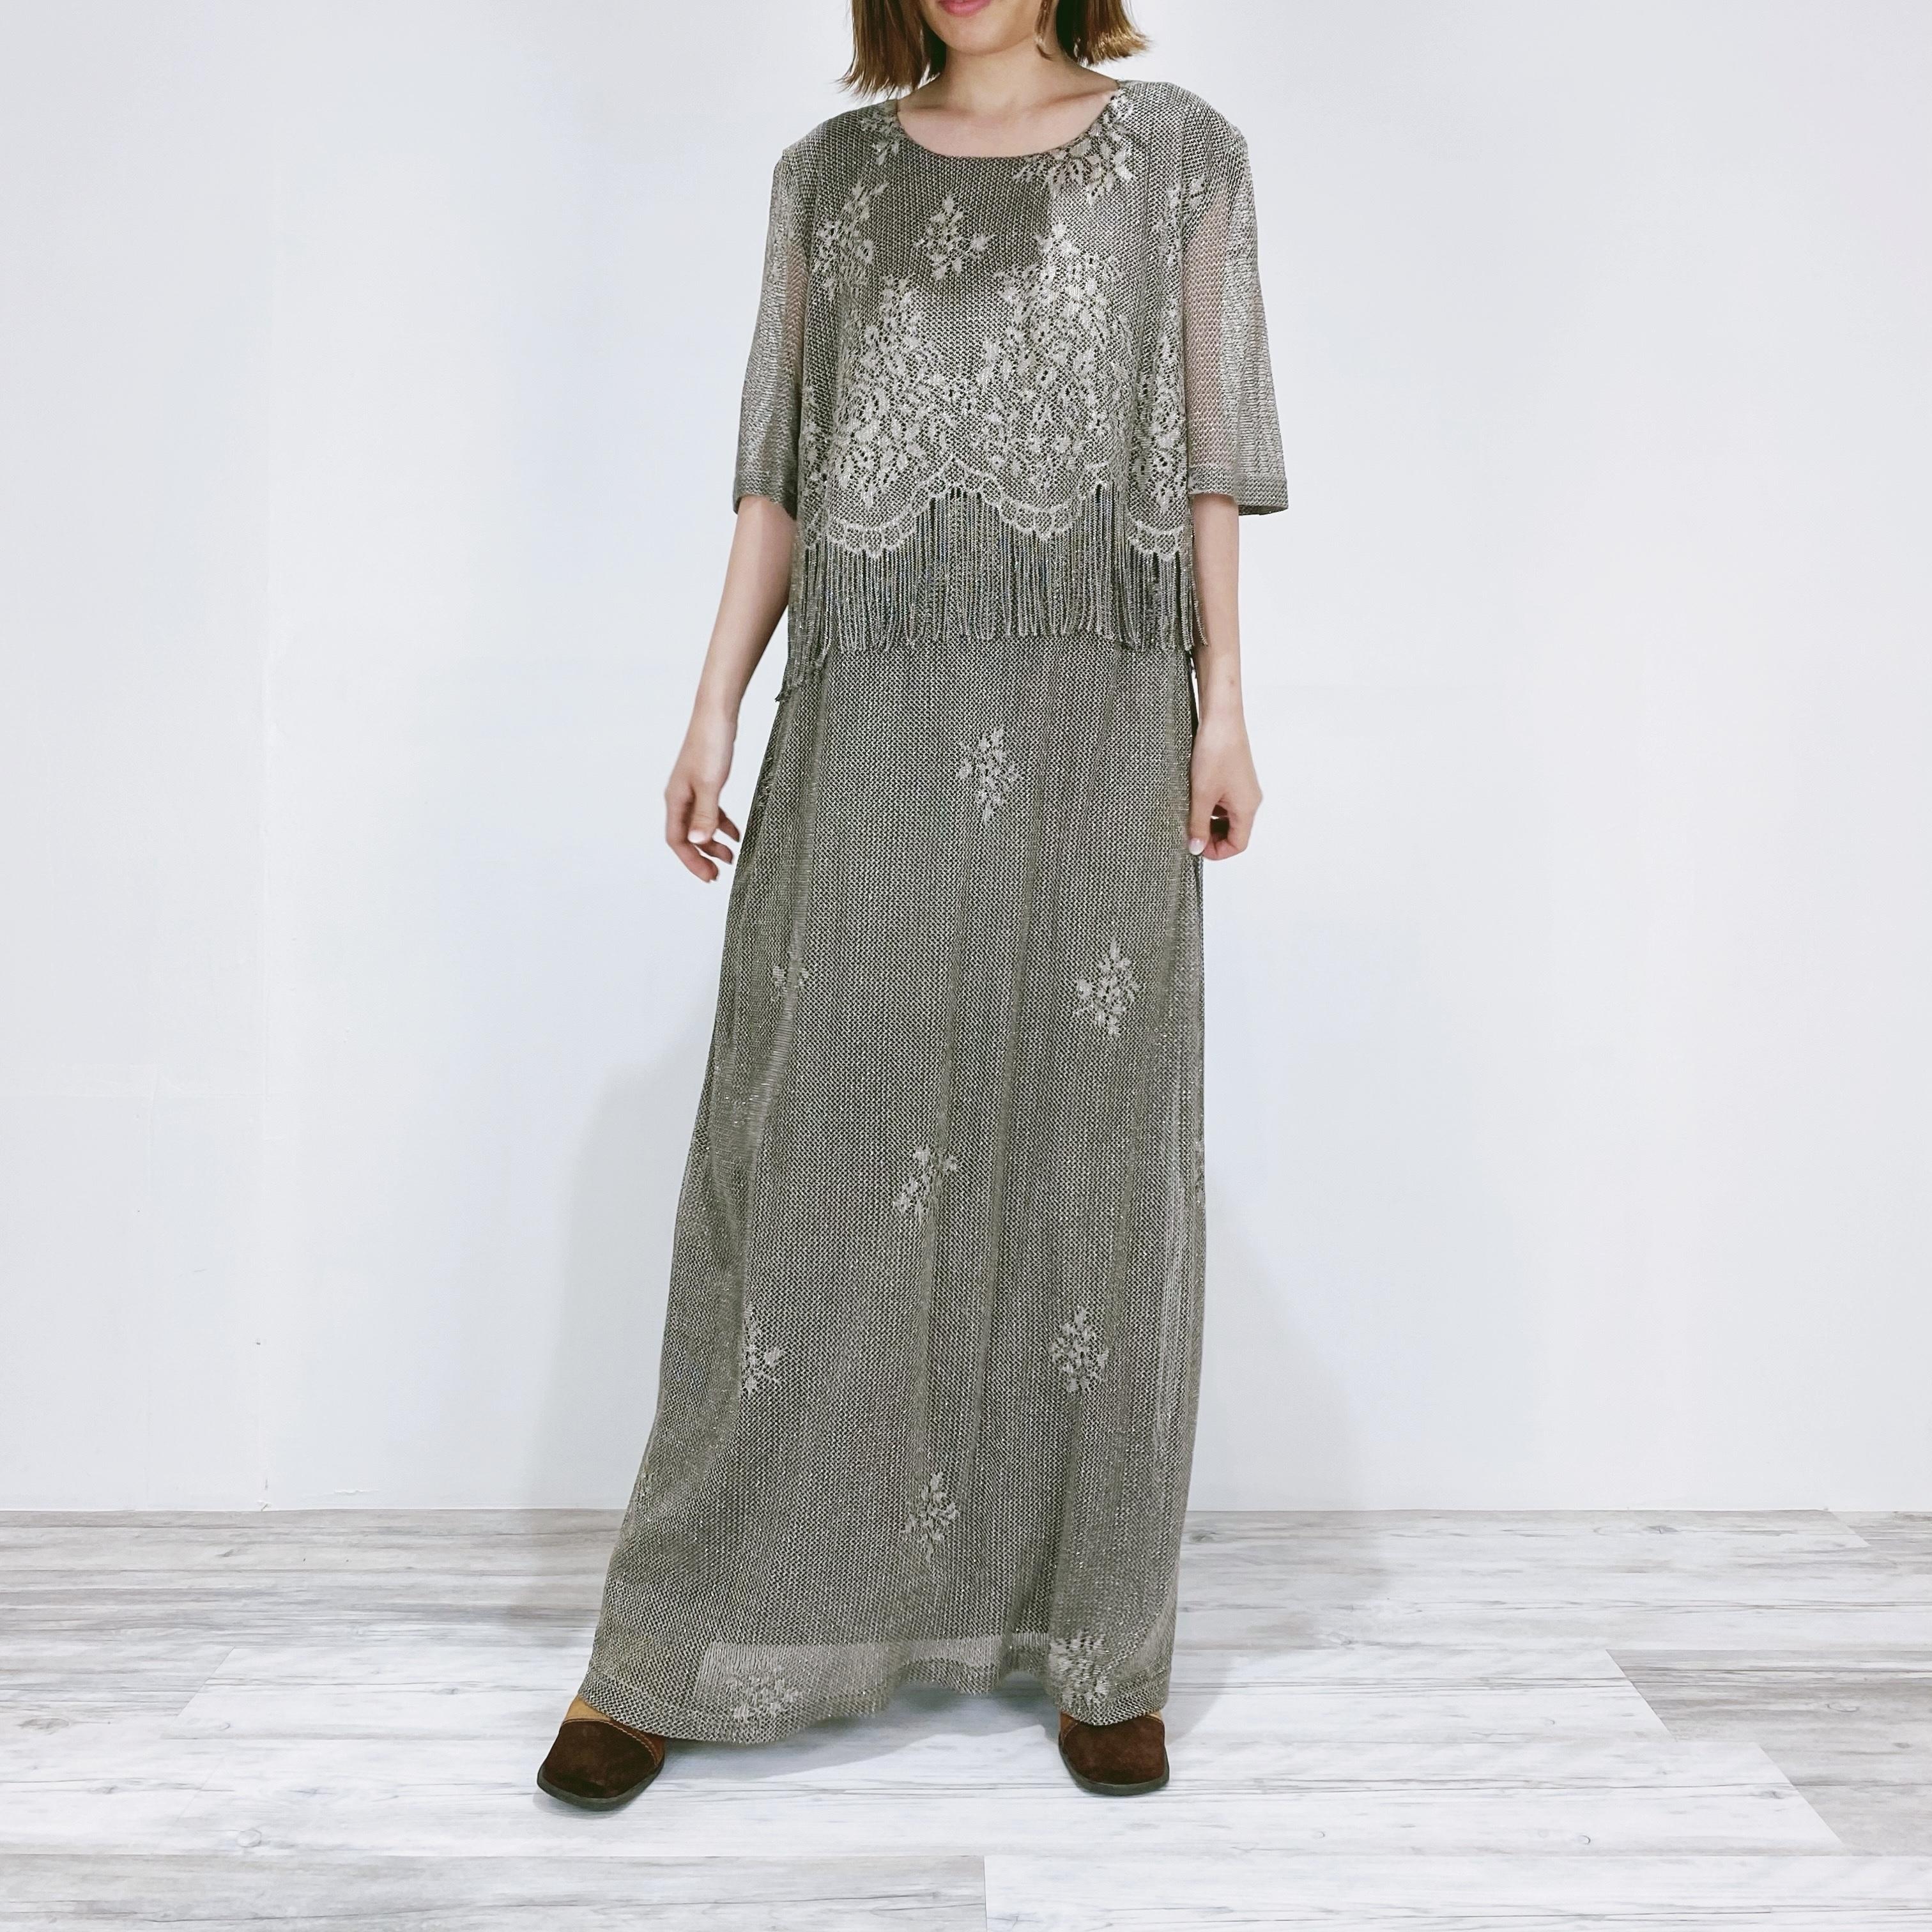 ◼︎80s vintage glitter fringe dress from Canada◼︎